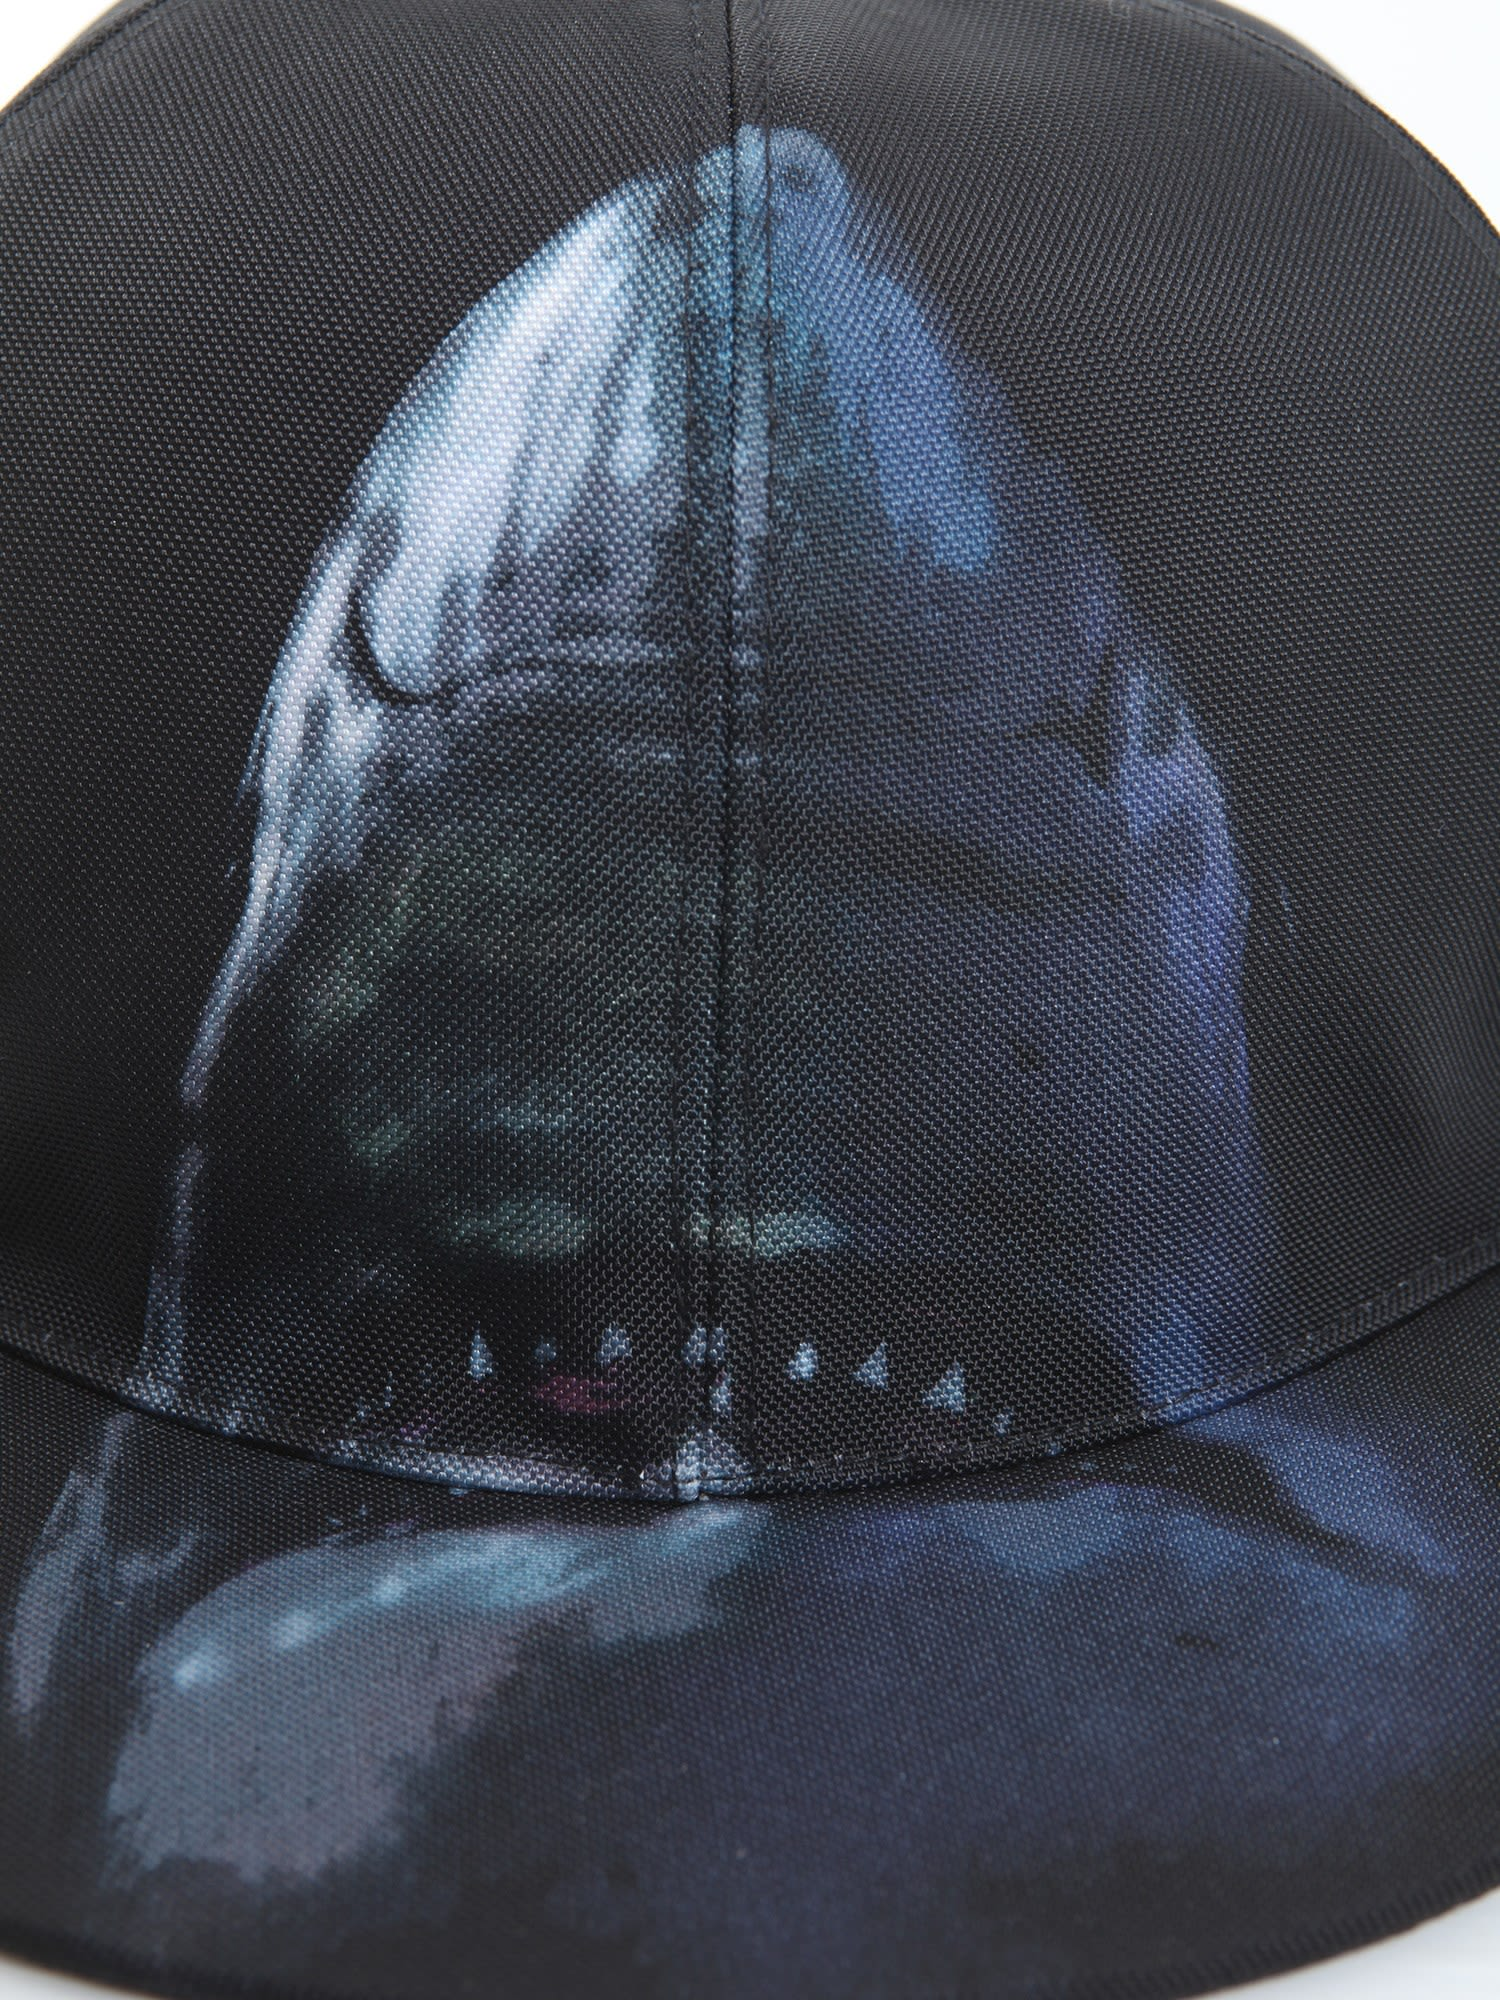 ... Givenchy Shark Printed Cap - NERO 62c70e72a05